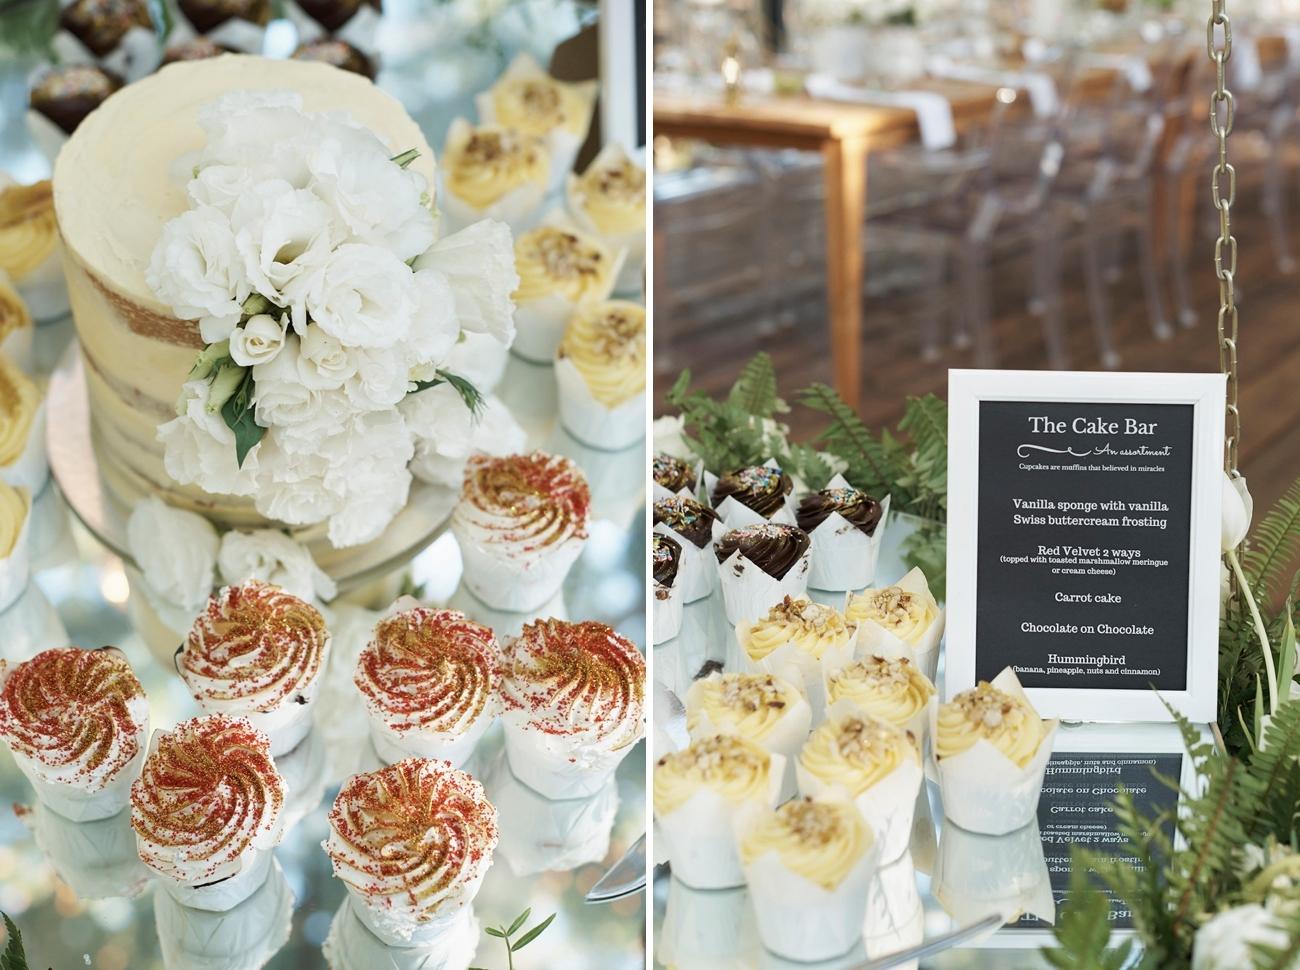 Wedding Cake Bar   Image: Knit Together Photography